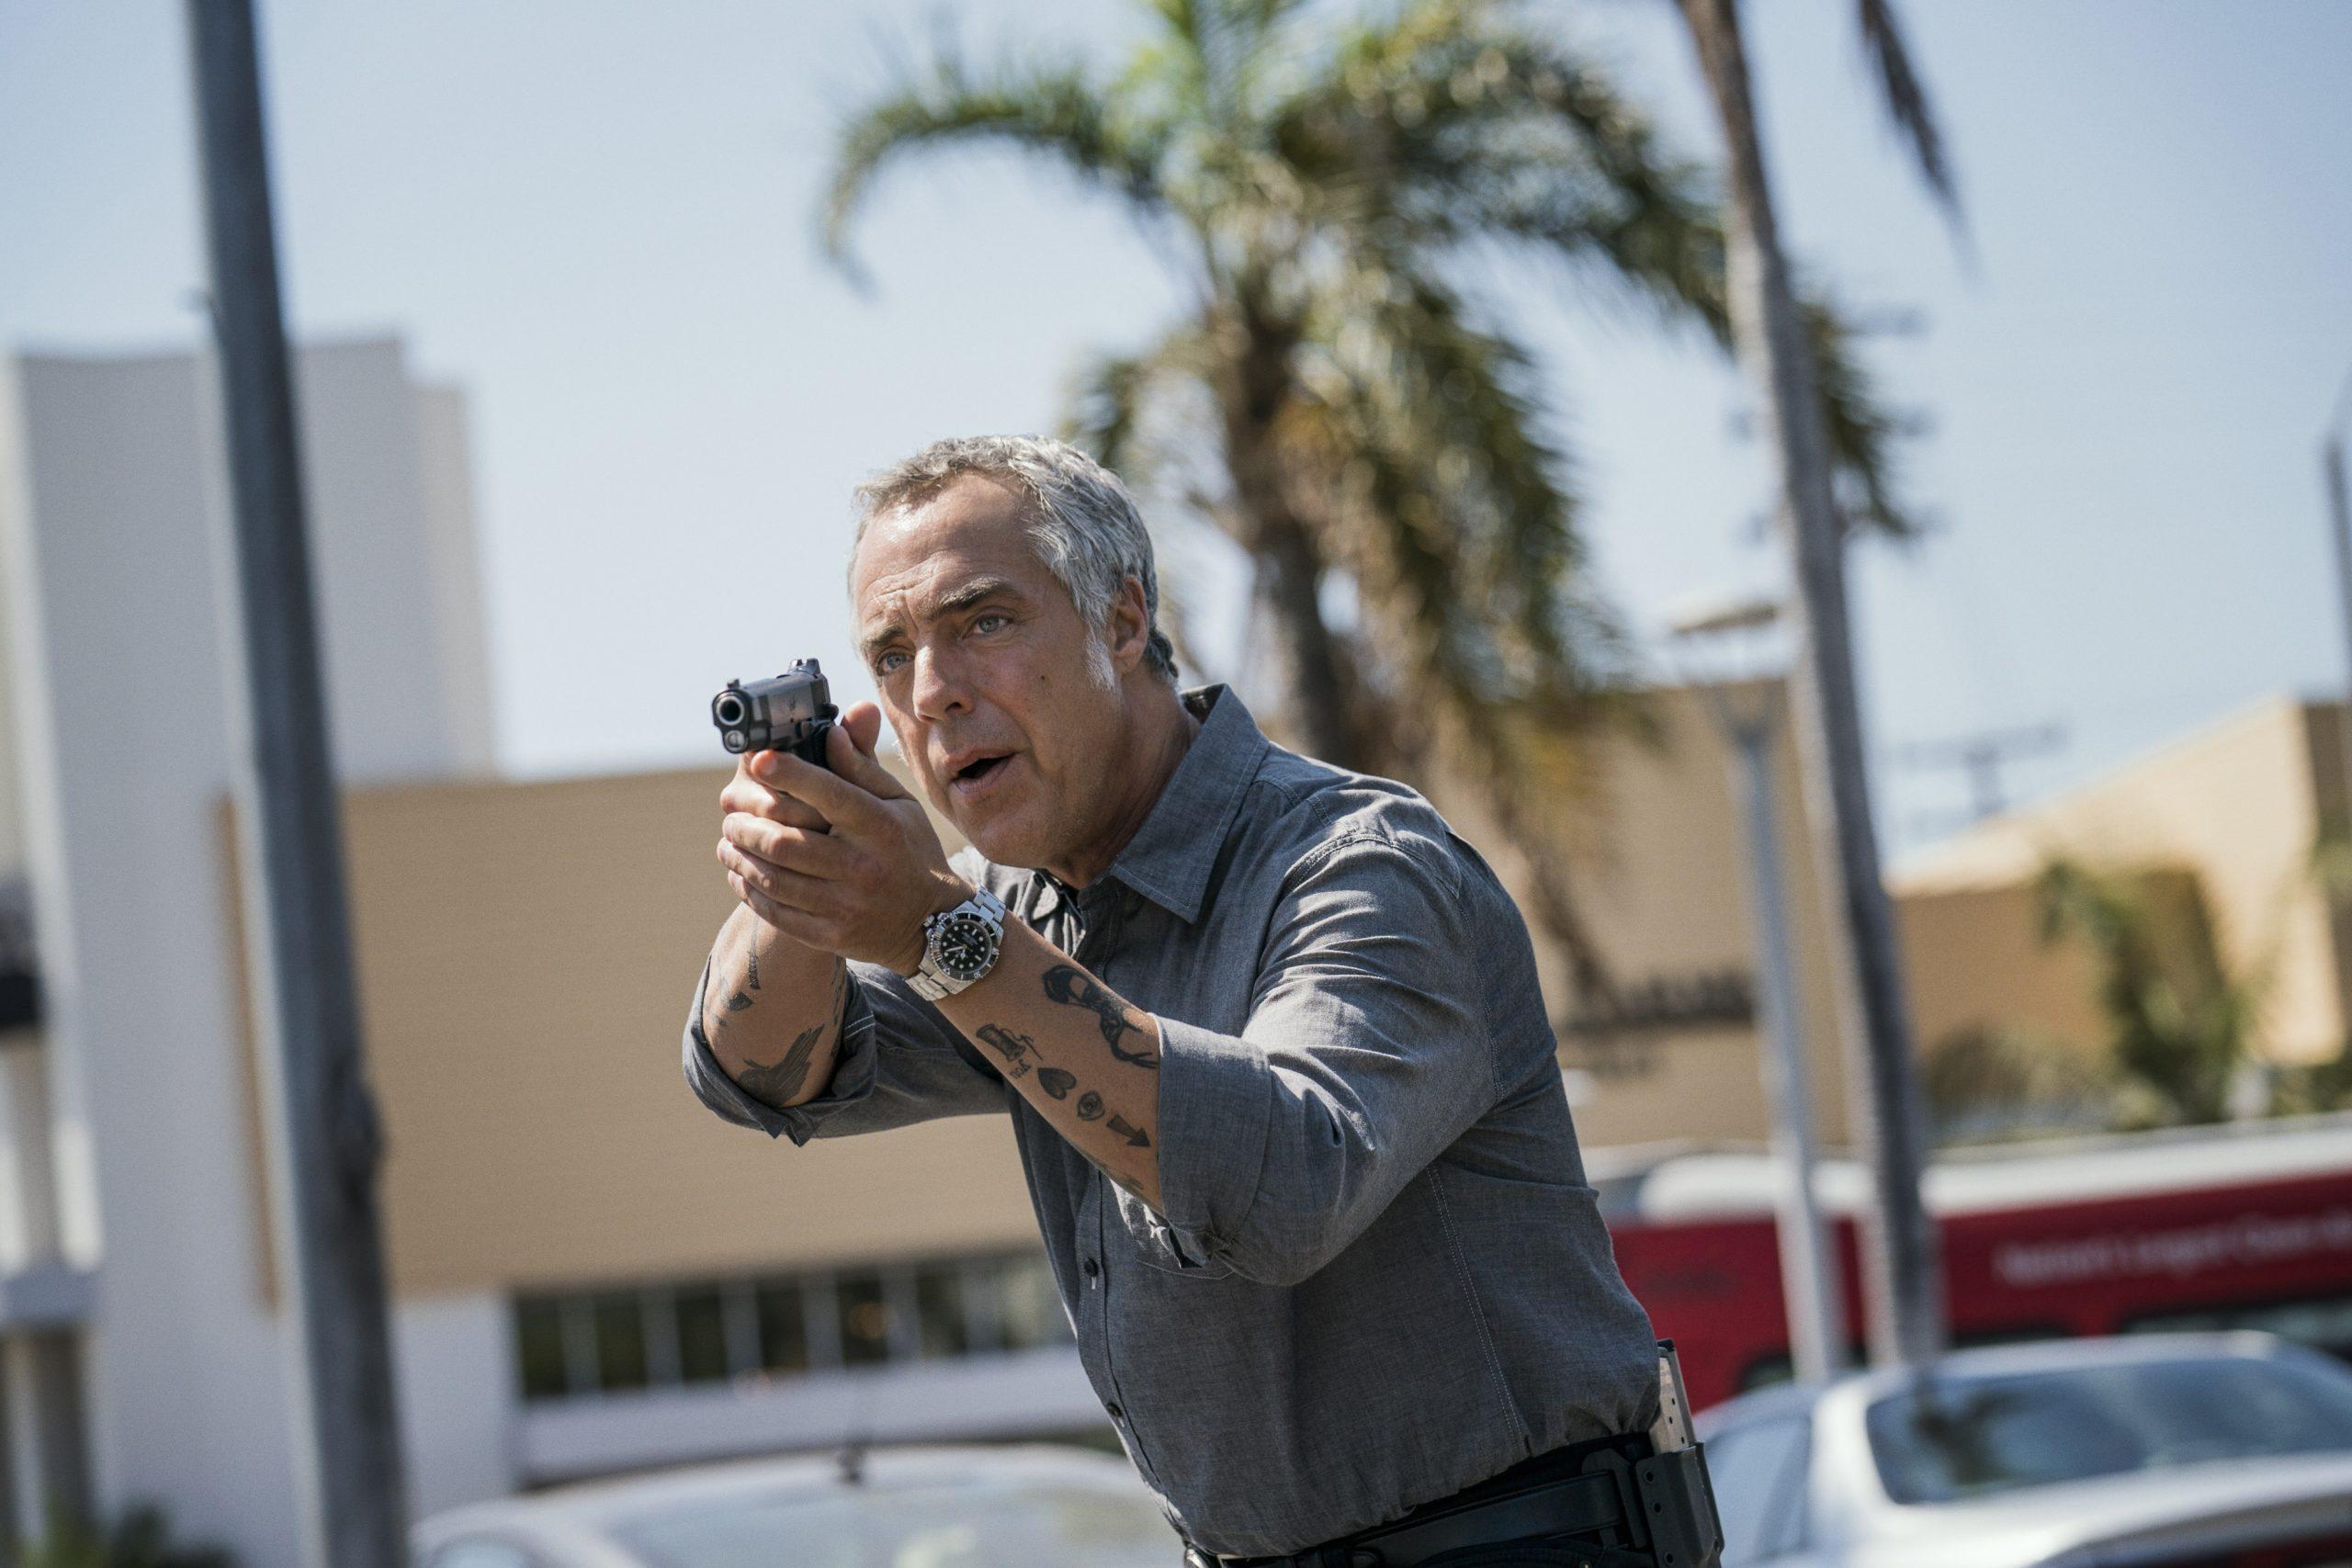 Titus Welliver pointing a gun in an episode of 'Bosch'